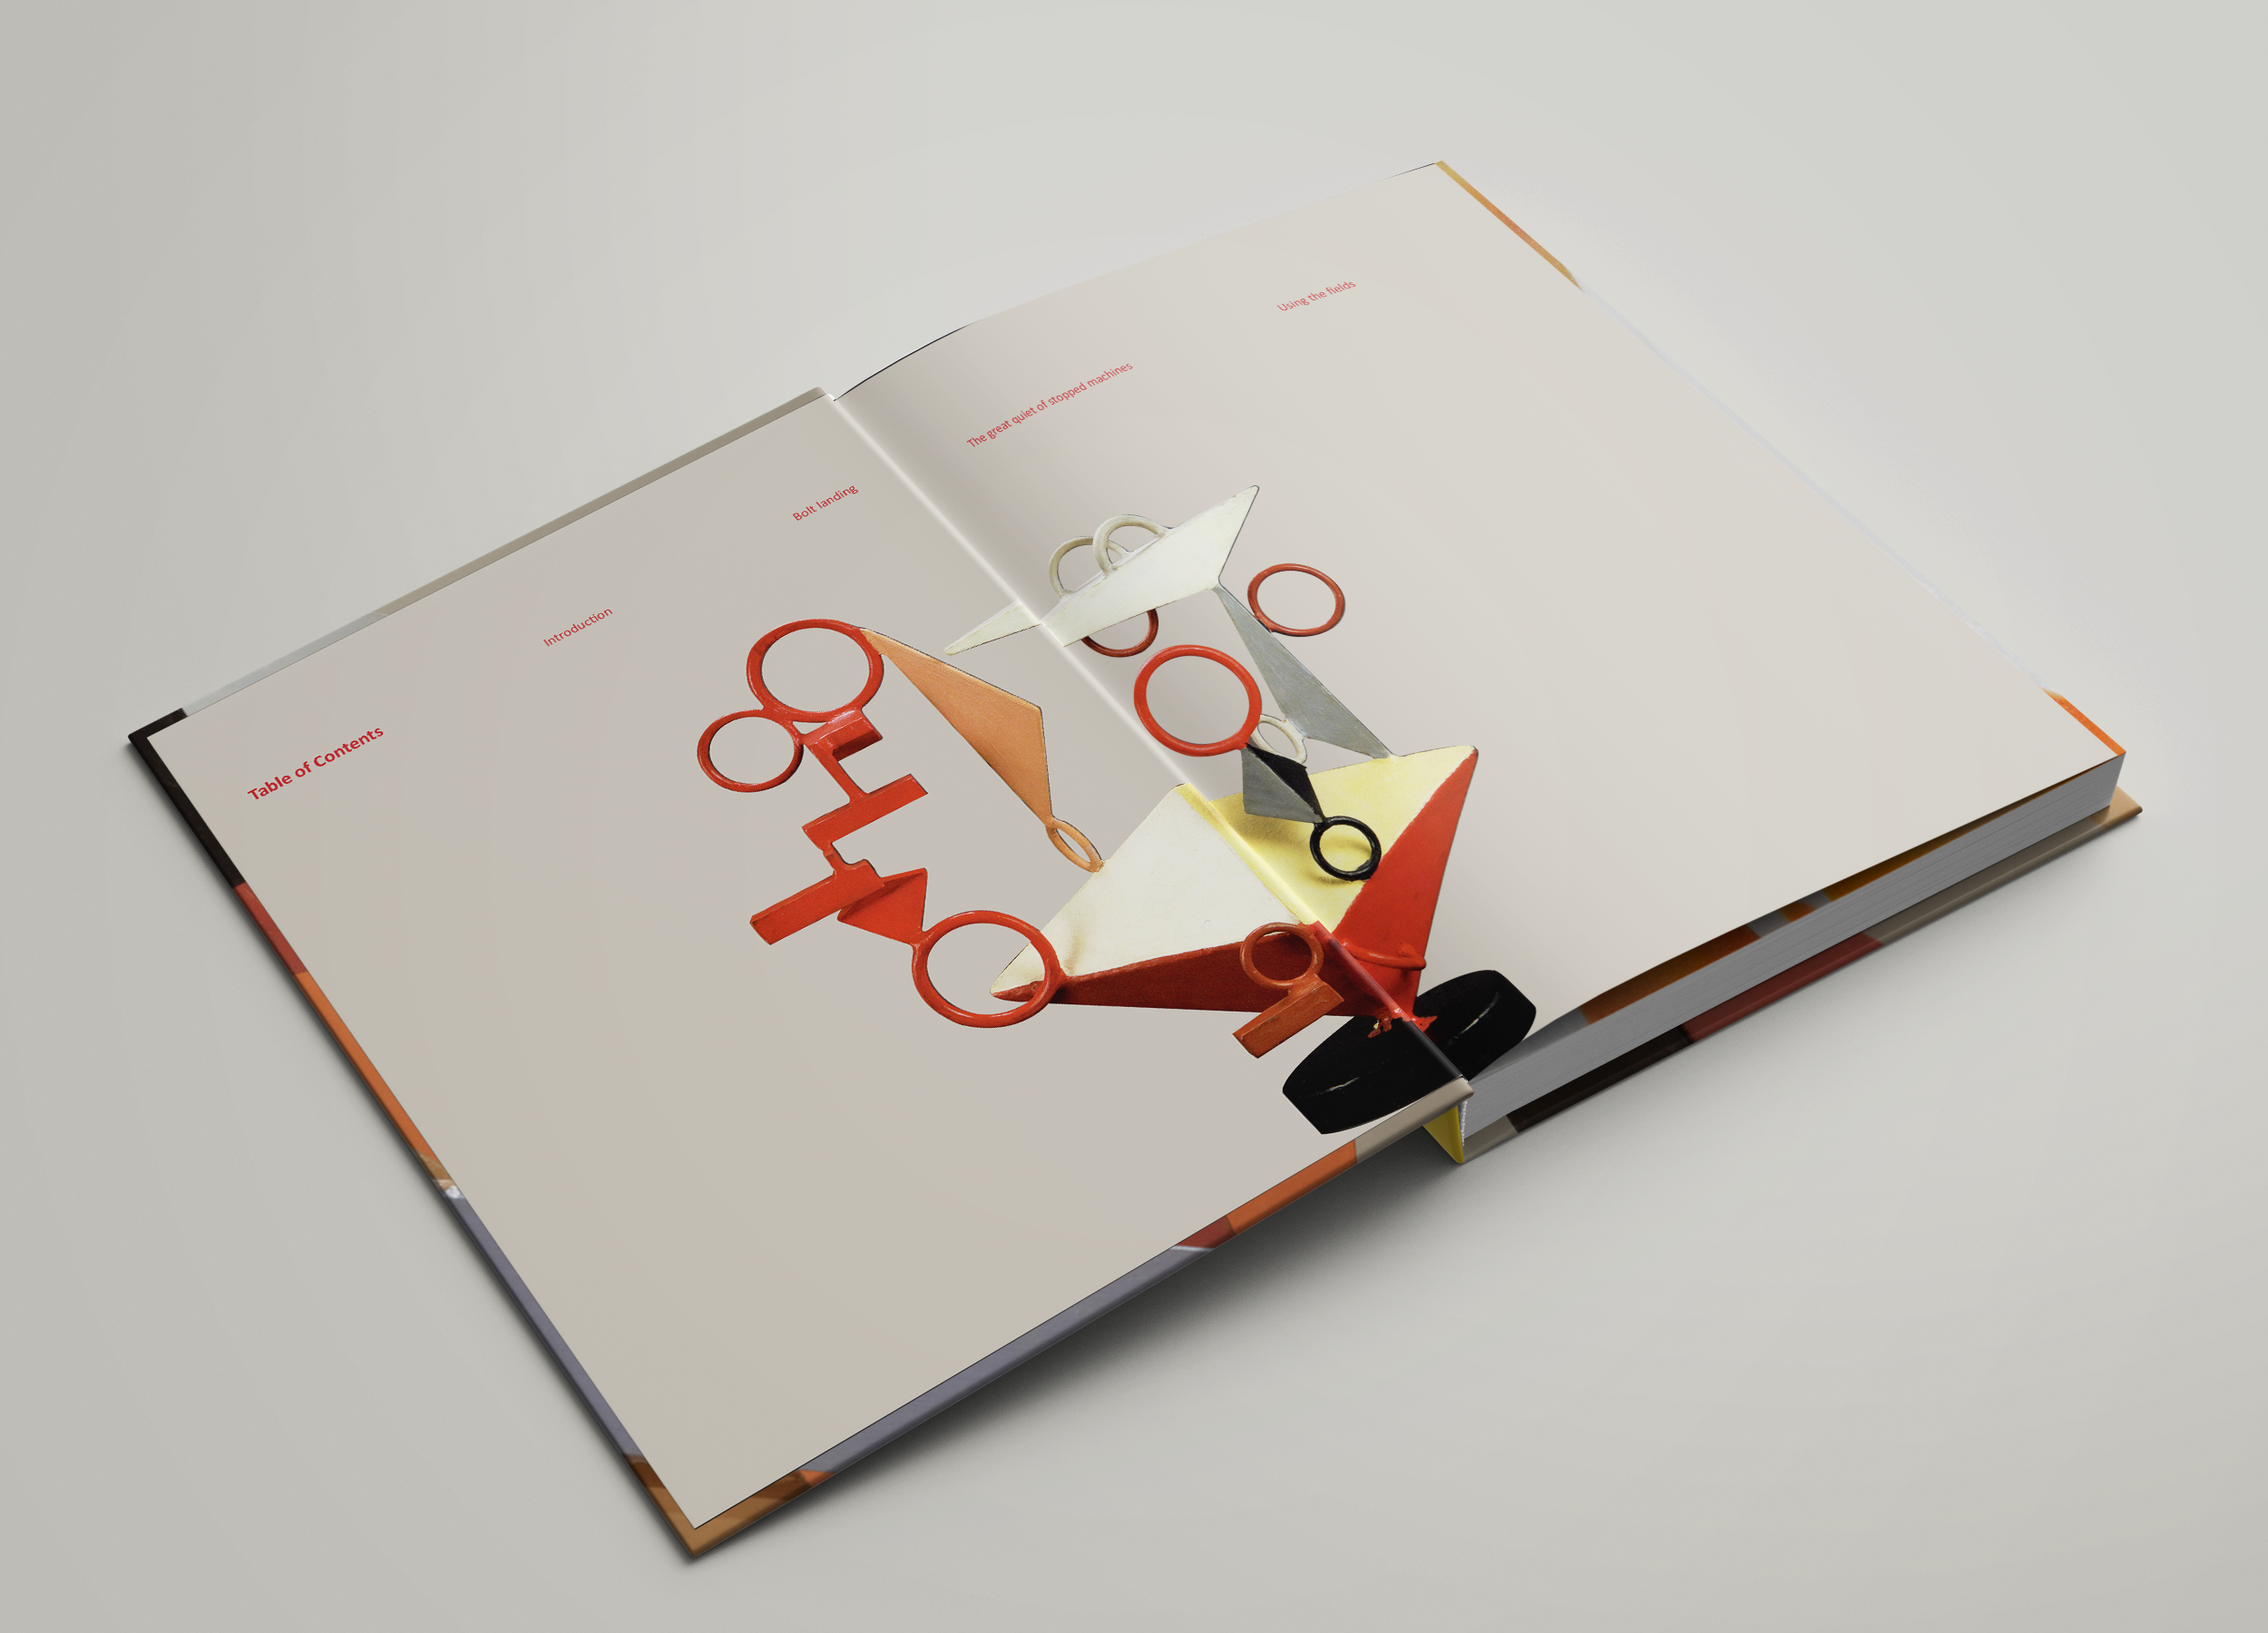 Book_Mockup_03 2.png